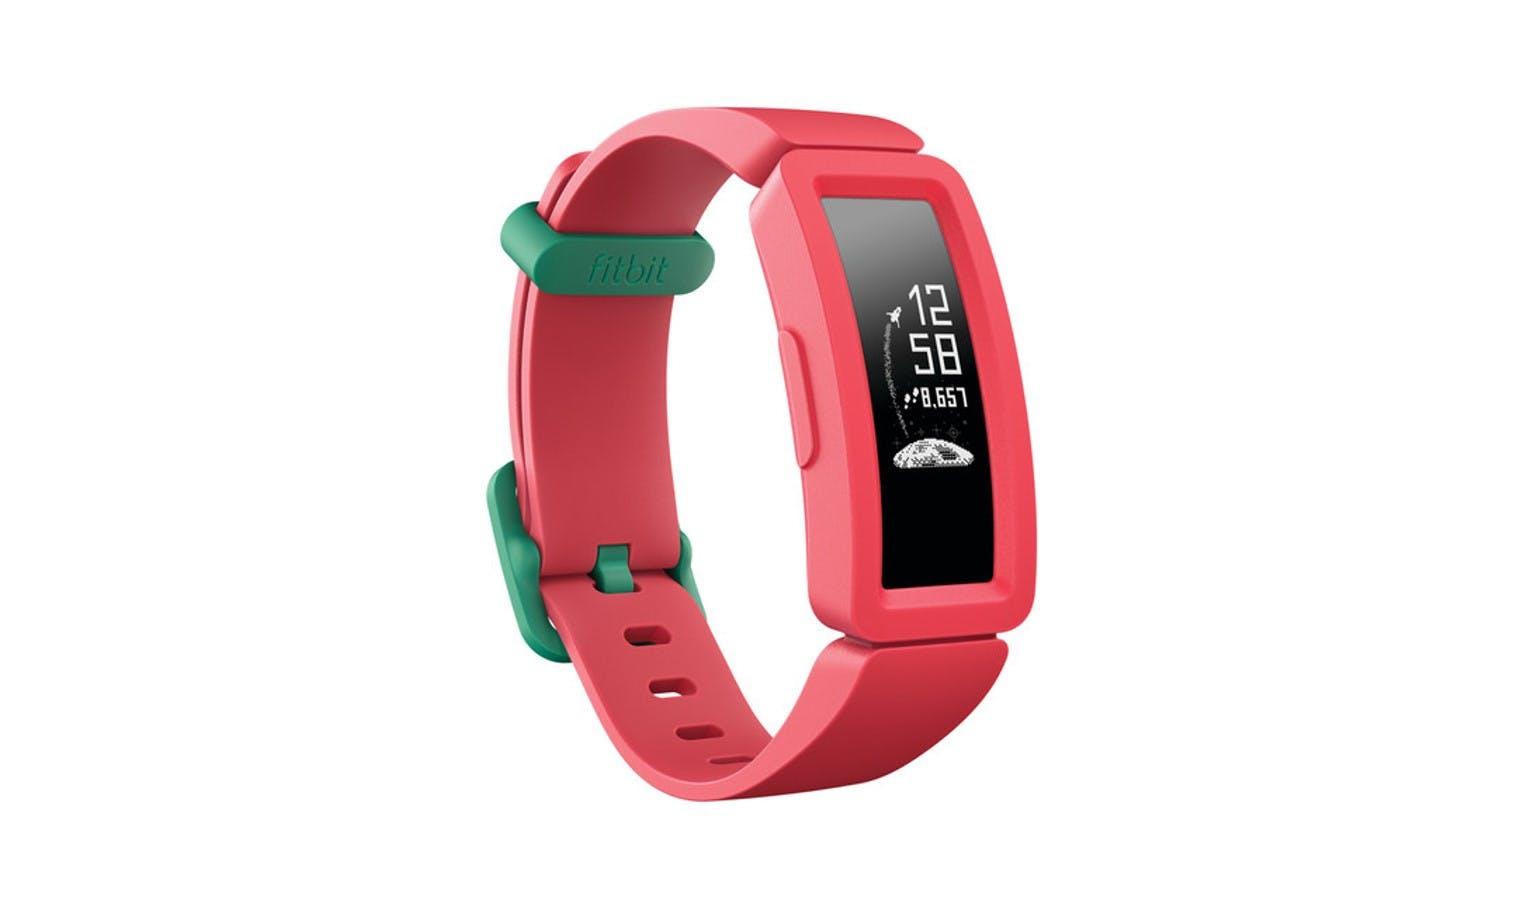 Fitbit Ace 2 Kids Activity Tracker - Watermelon/Teal | Harvey ...